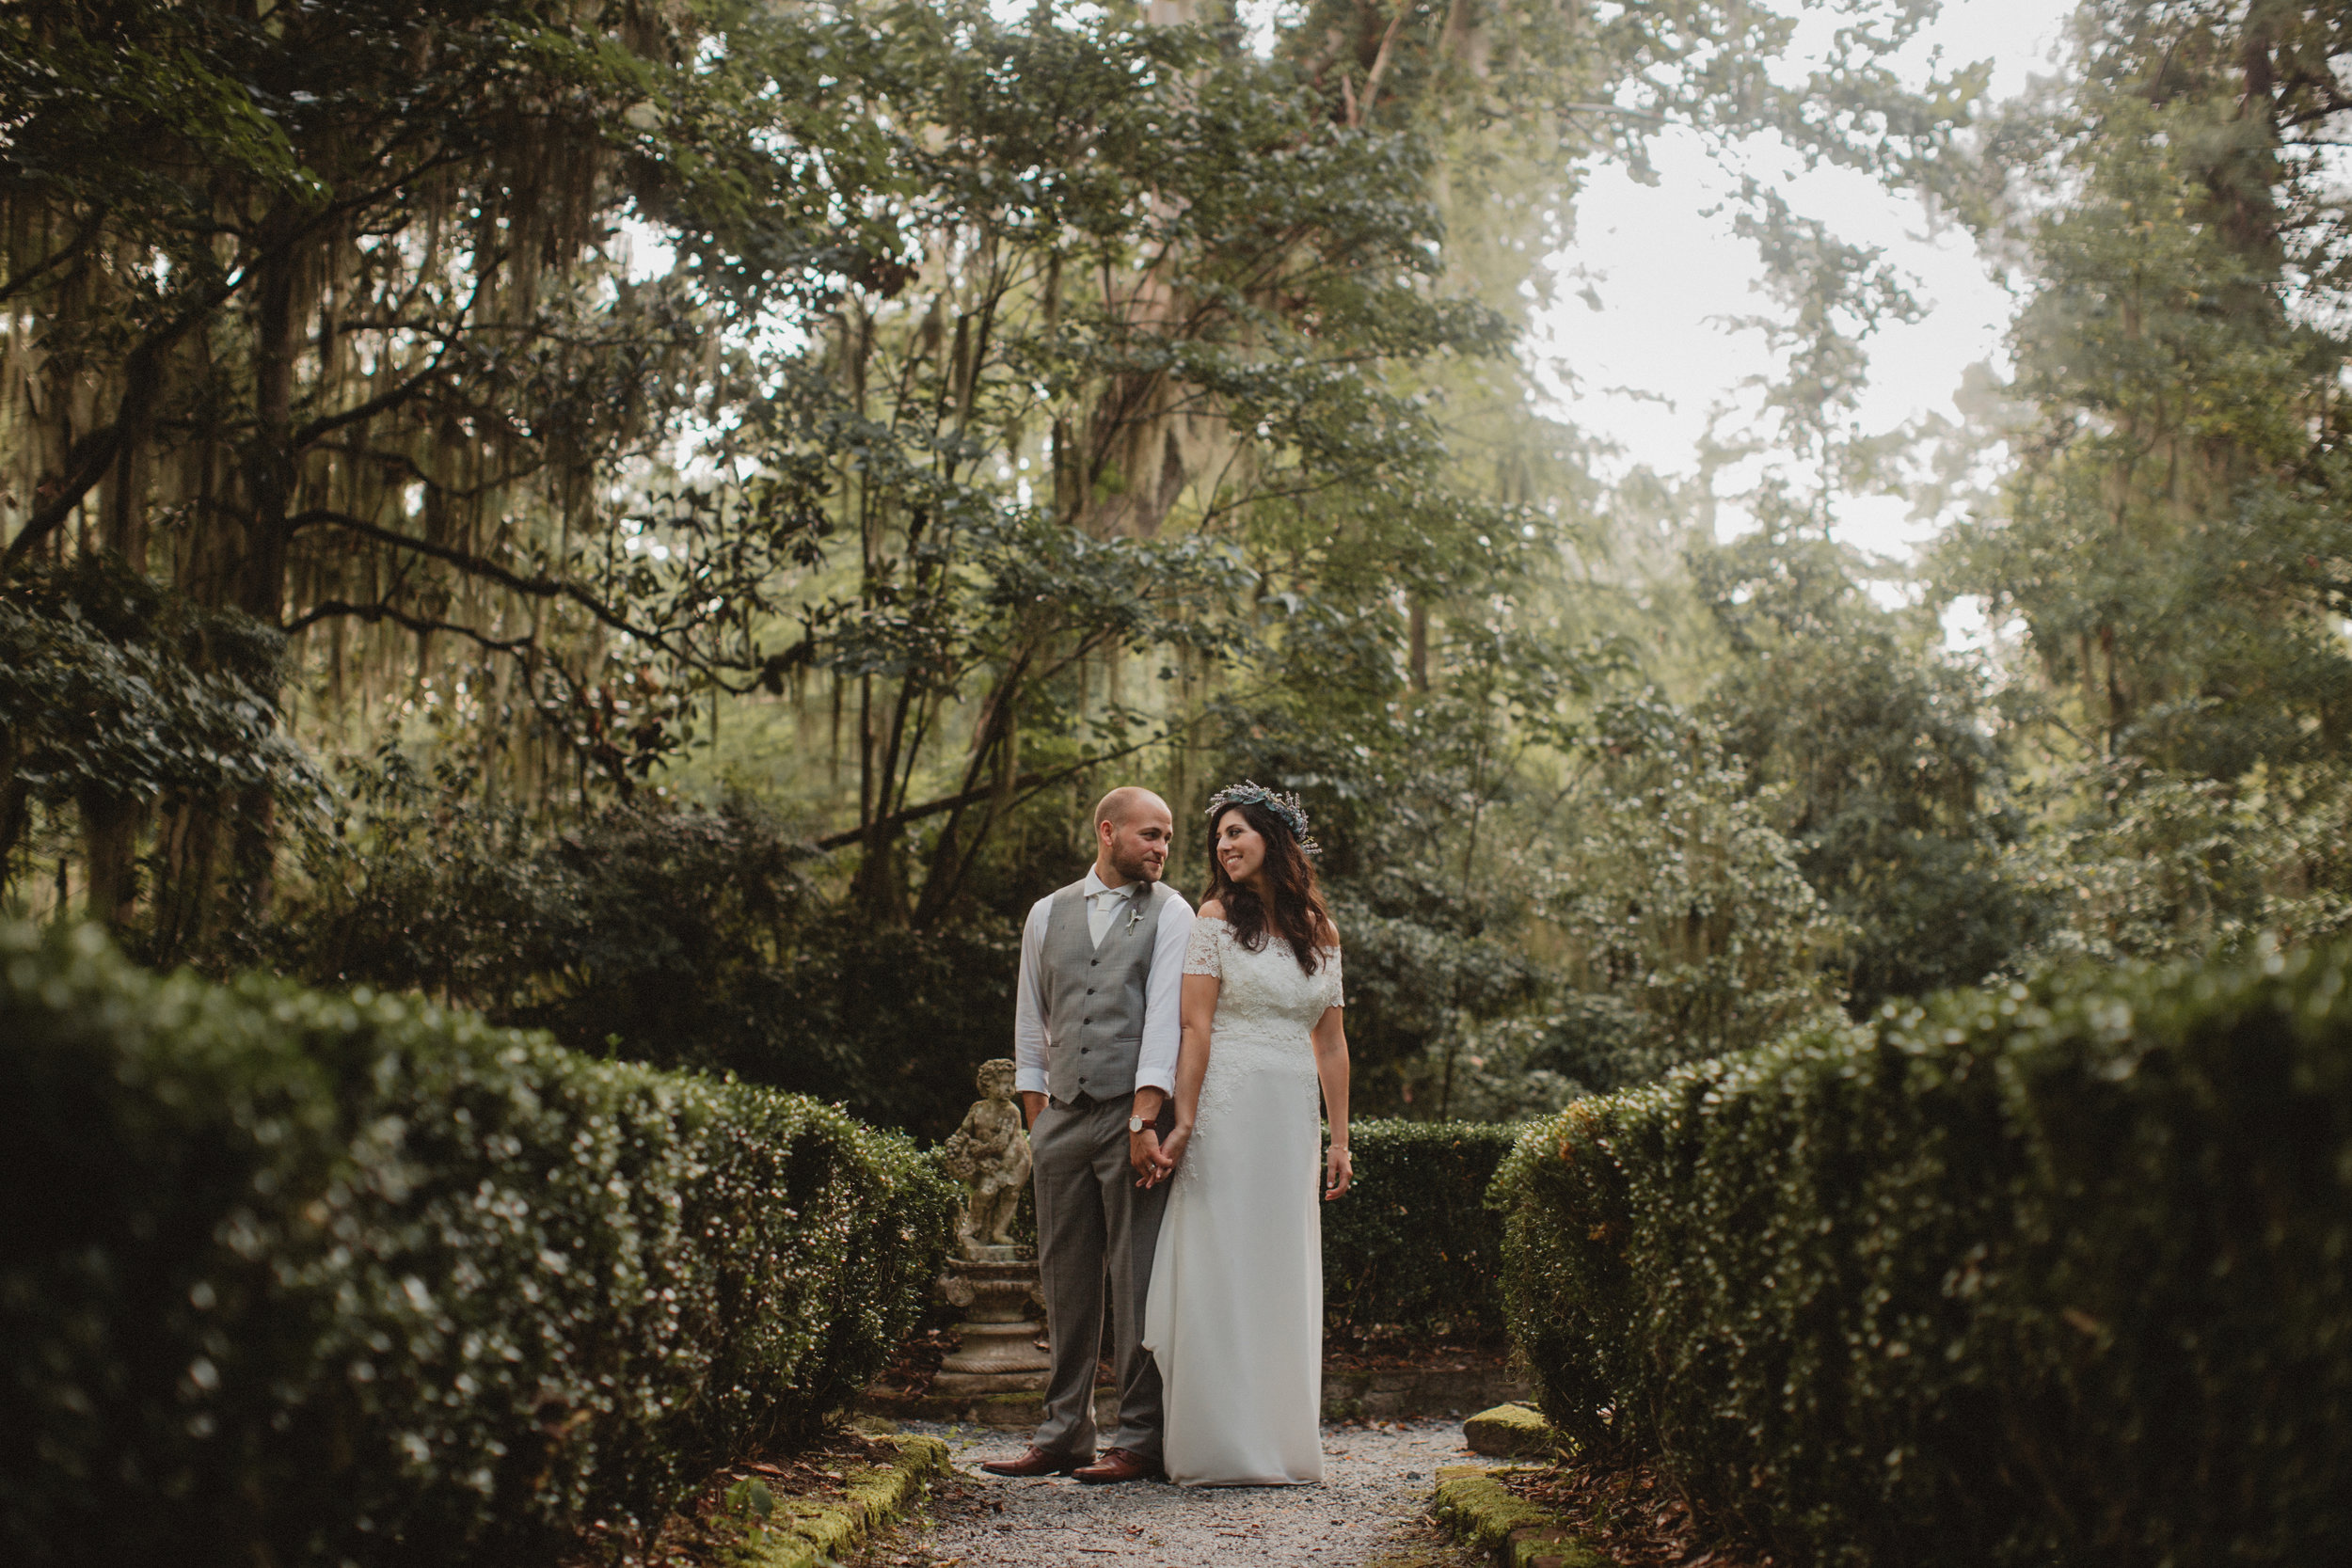 Gina + Matt's Magnolia Plantation and Gardens wedding